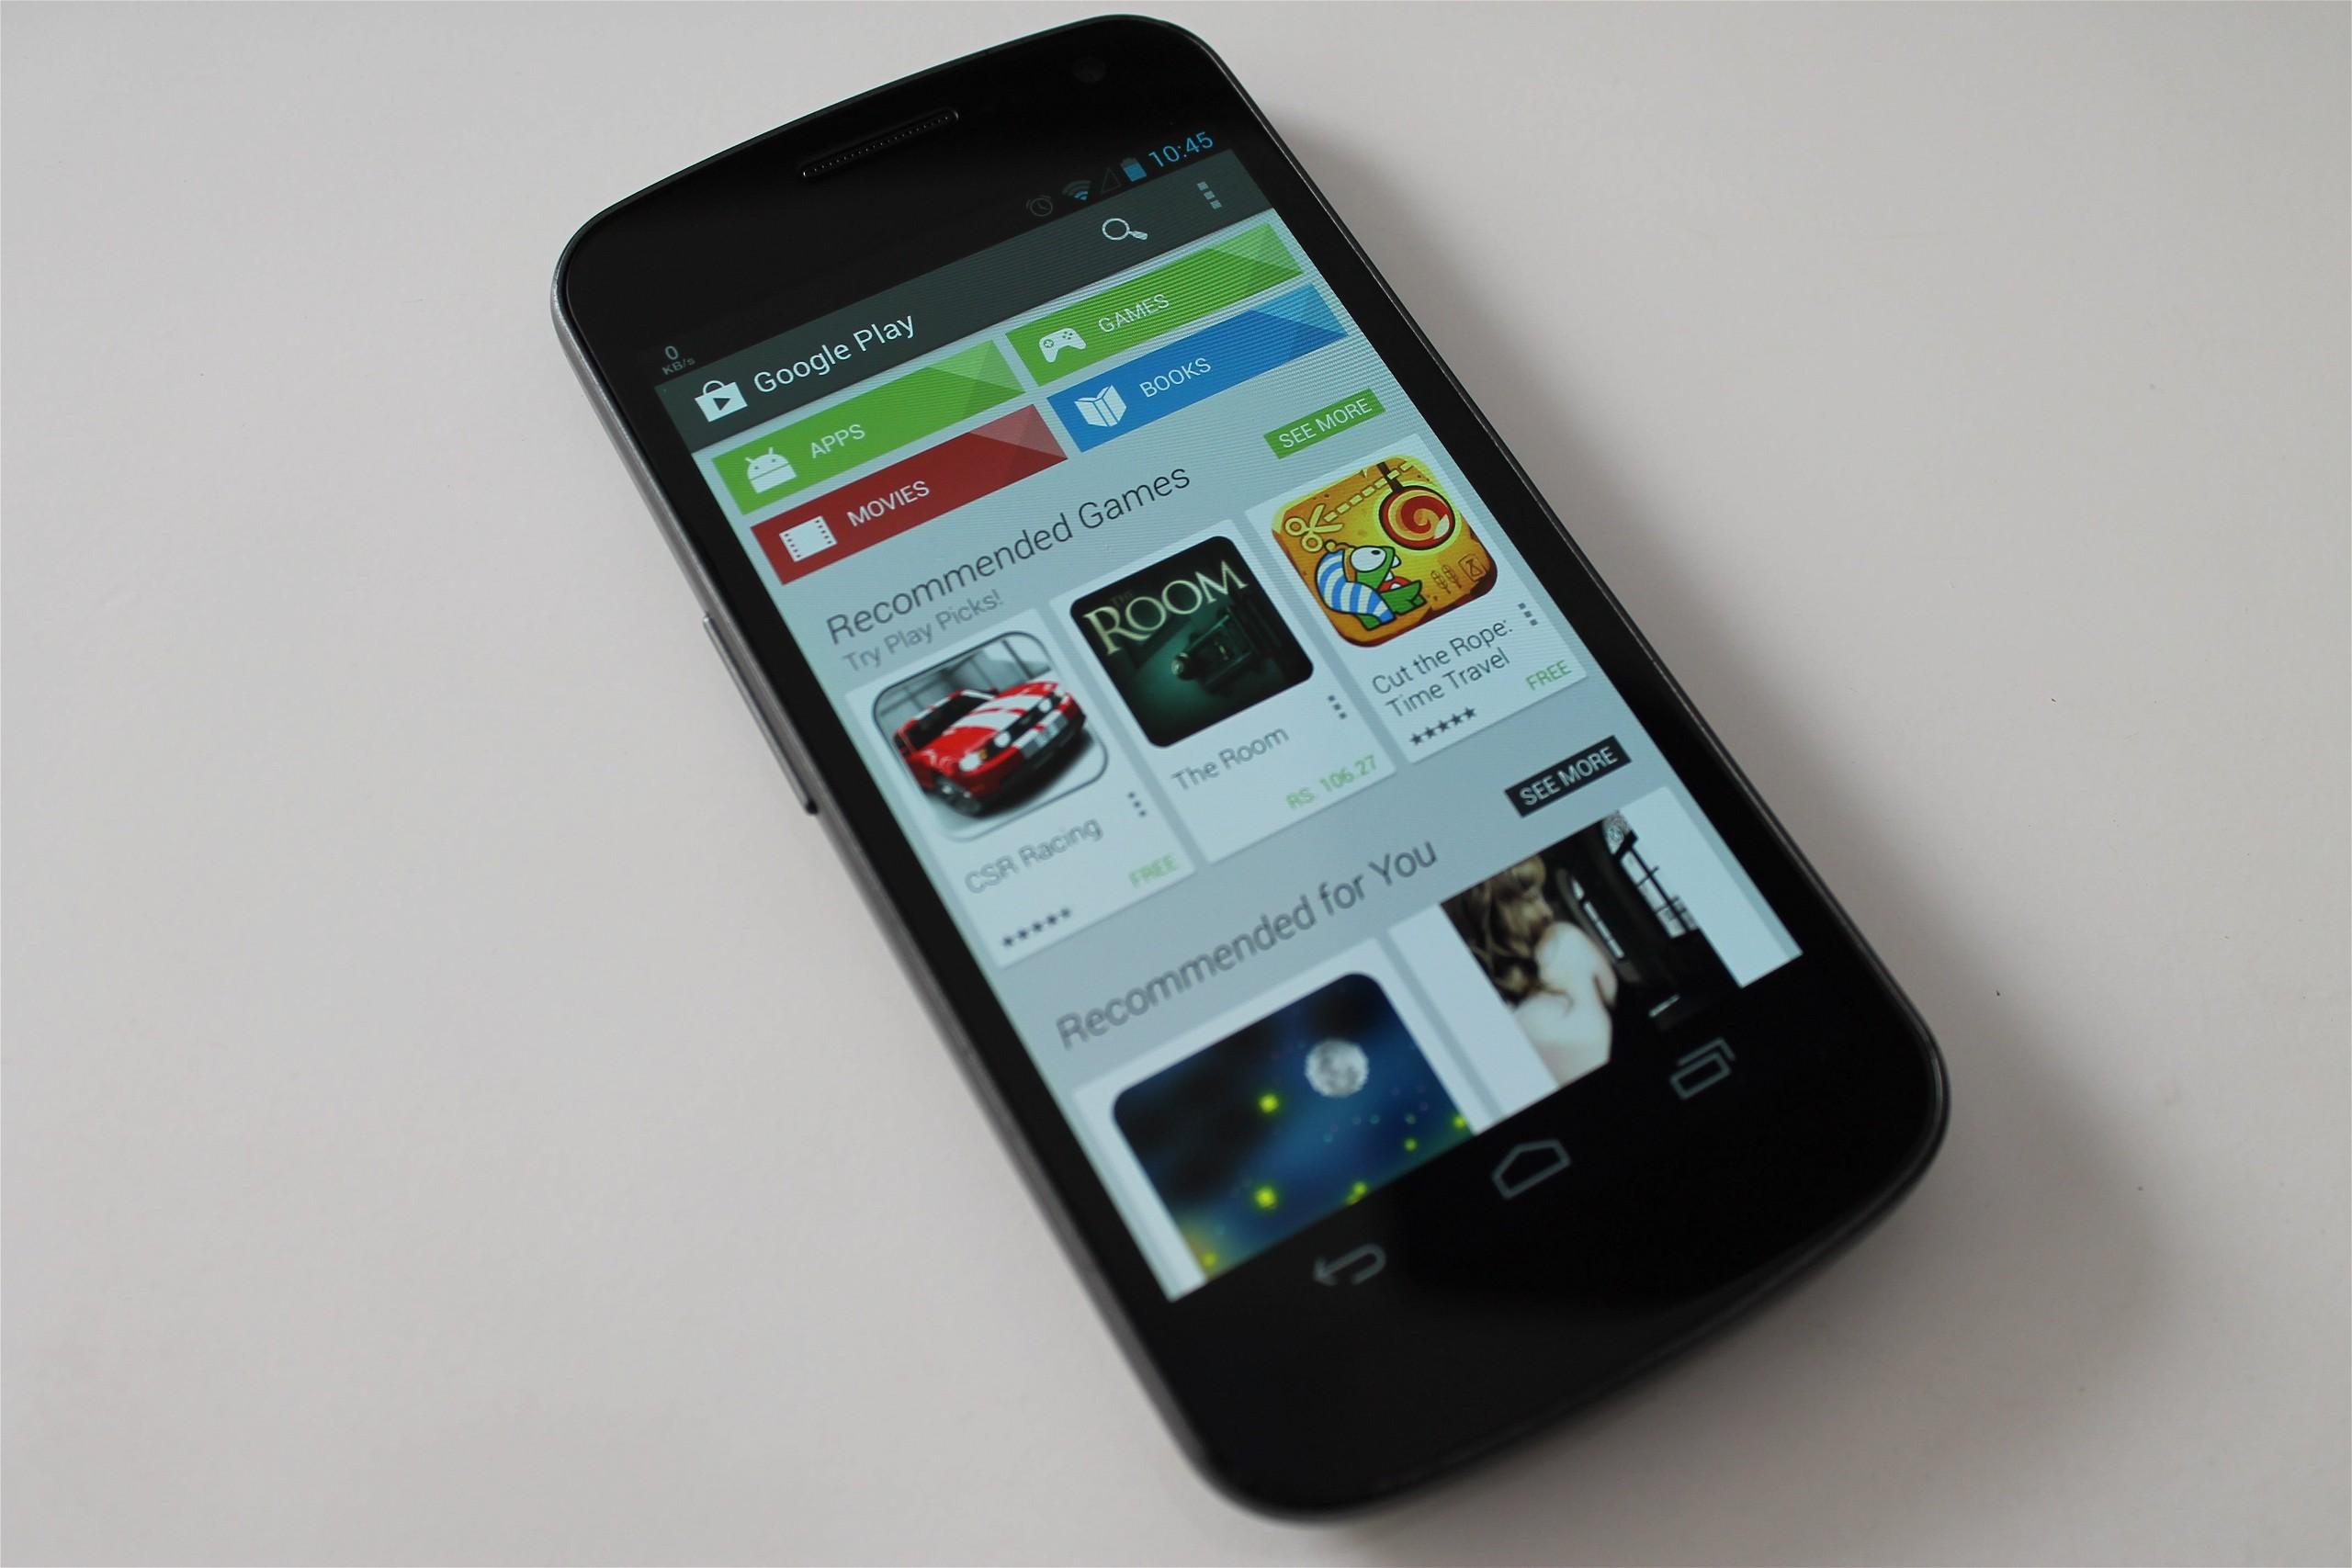 Google Play Store Galaxy Nexus